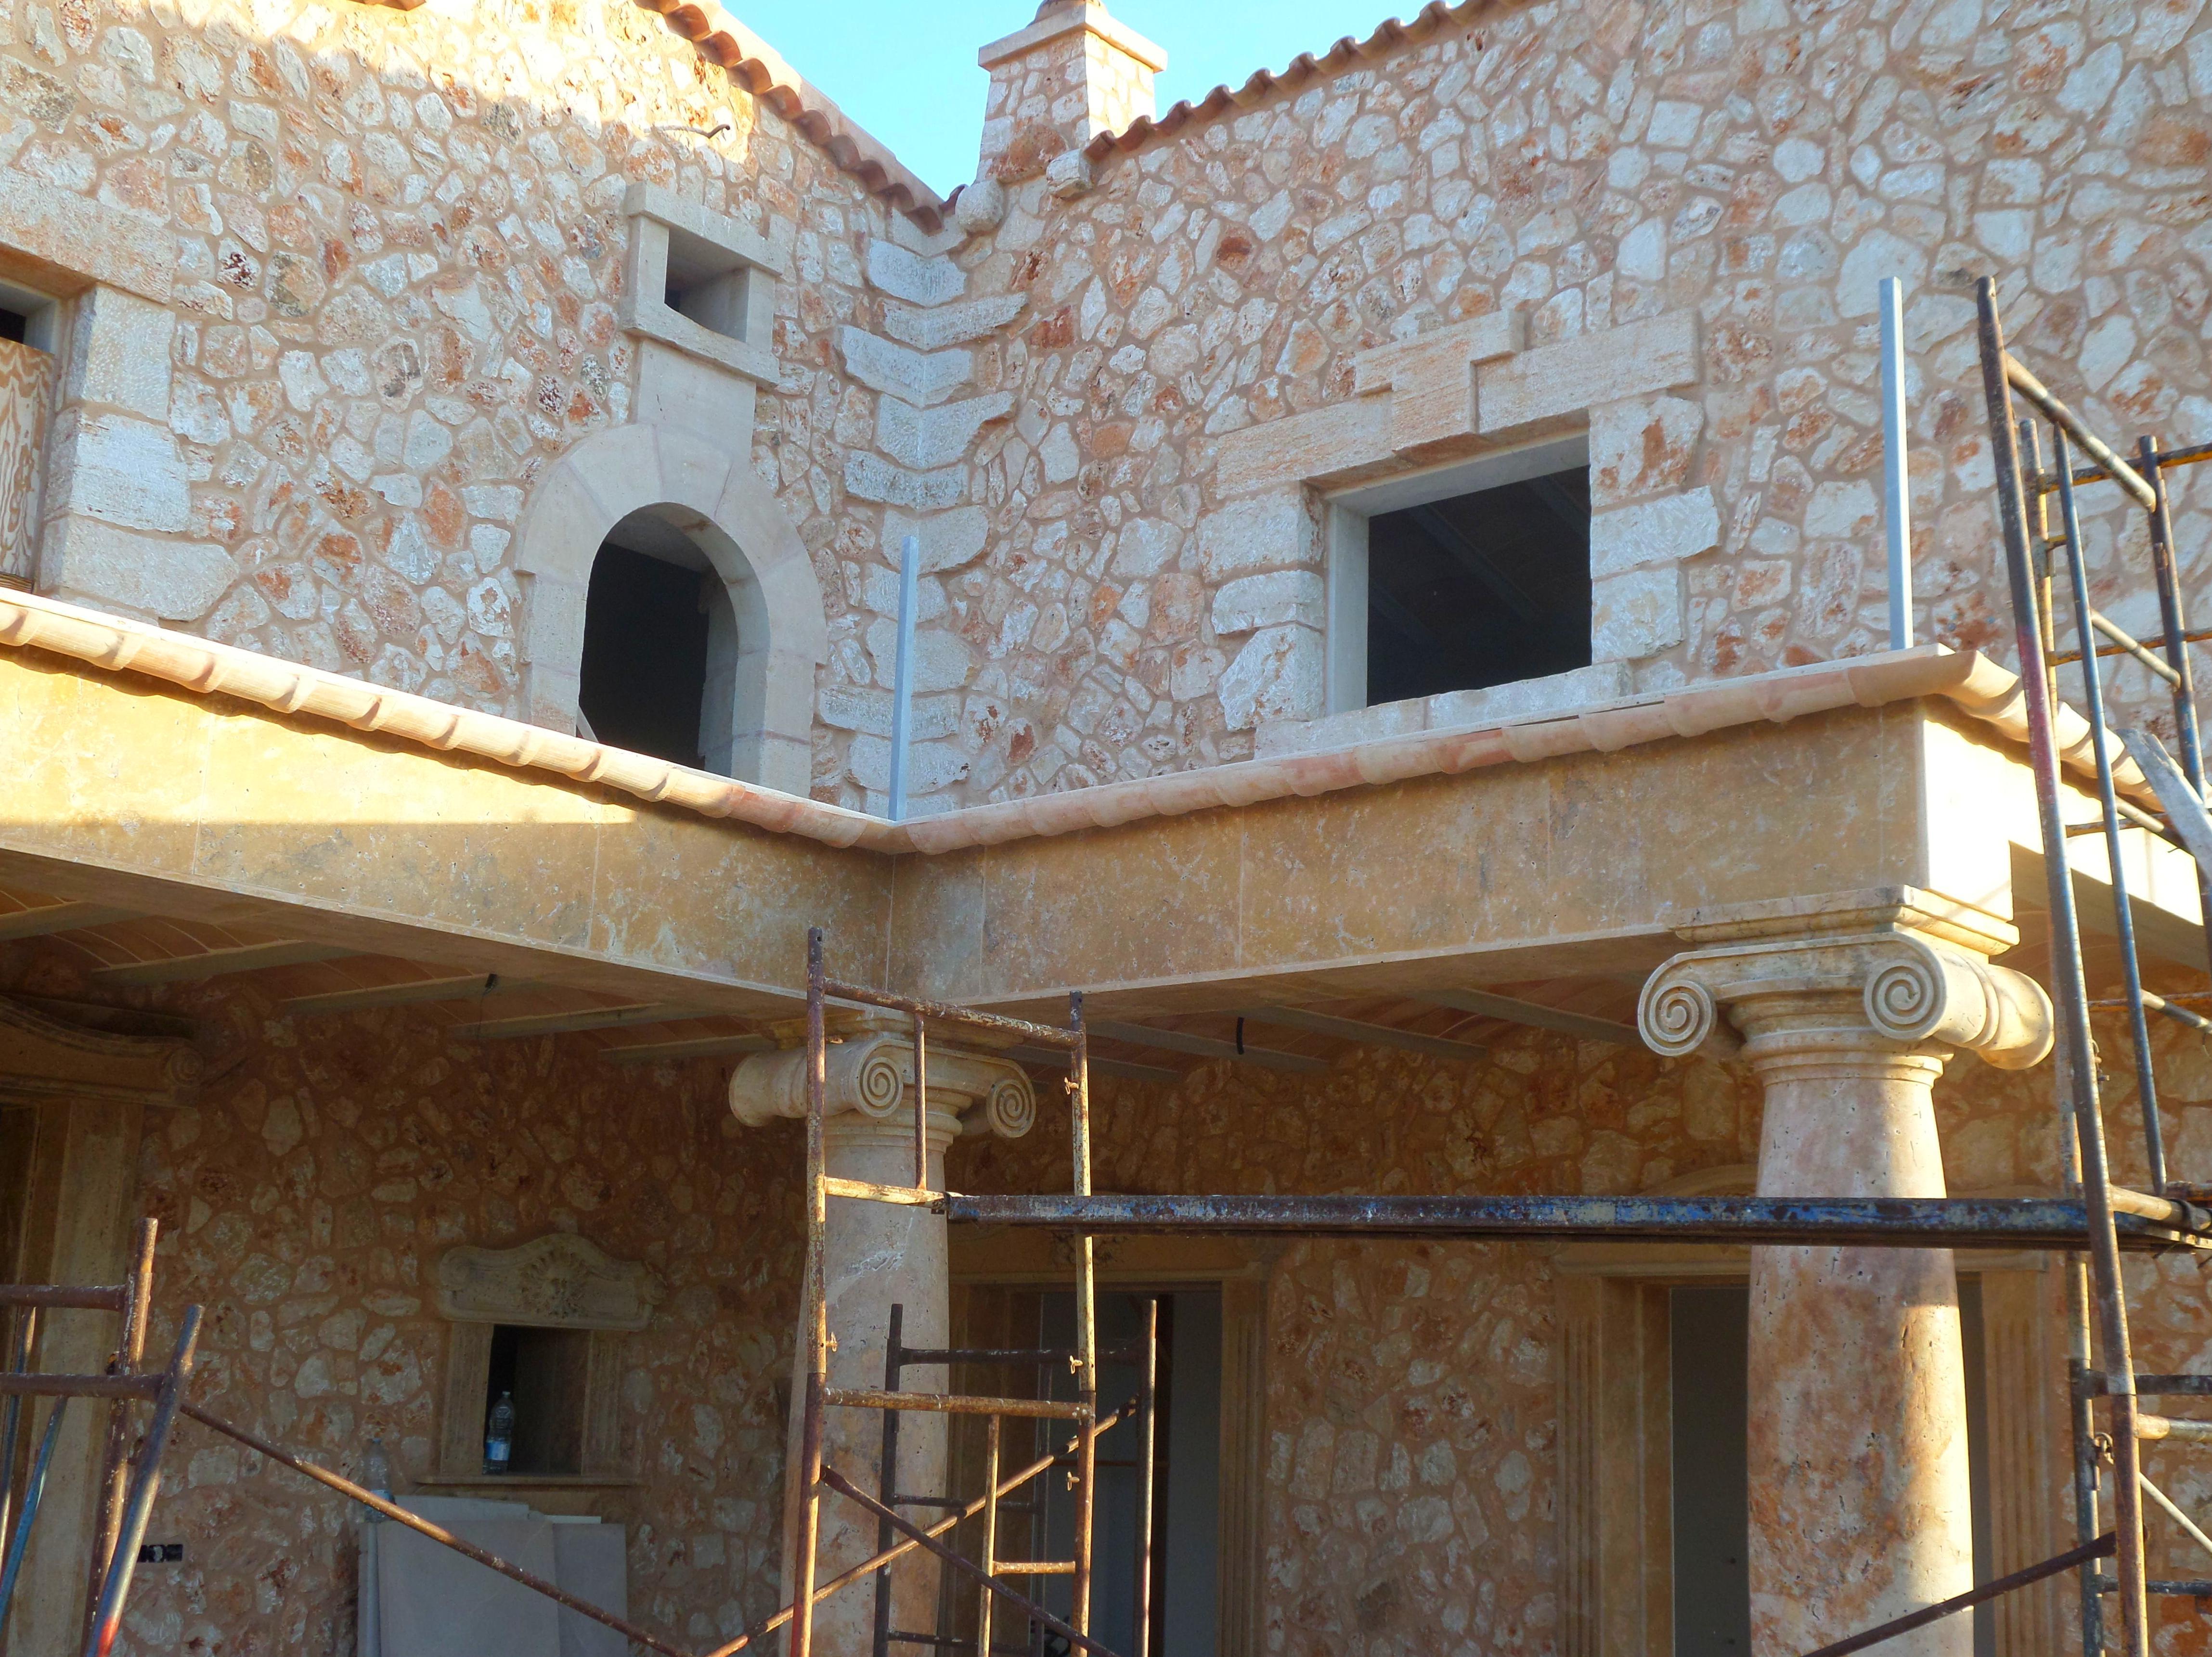 Detalle de fachada y columnas de marmol travertino macizo